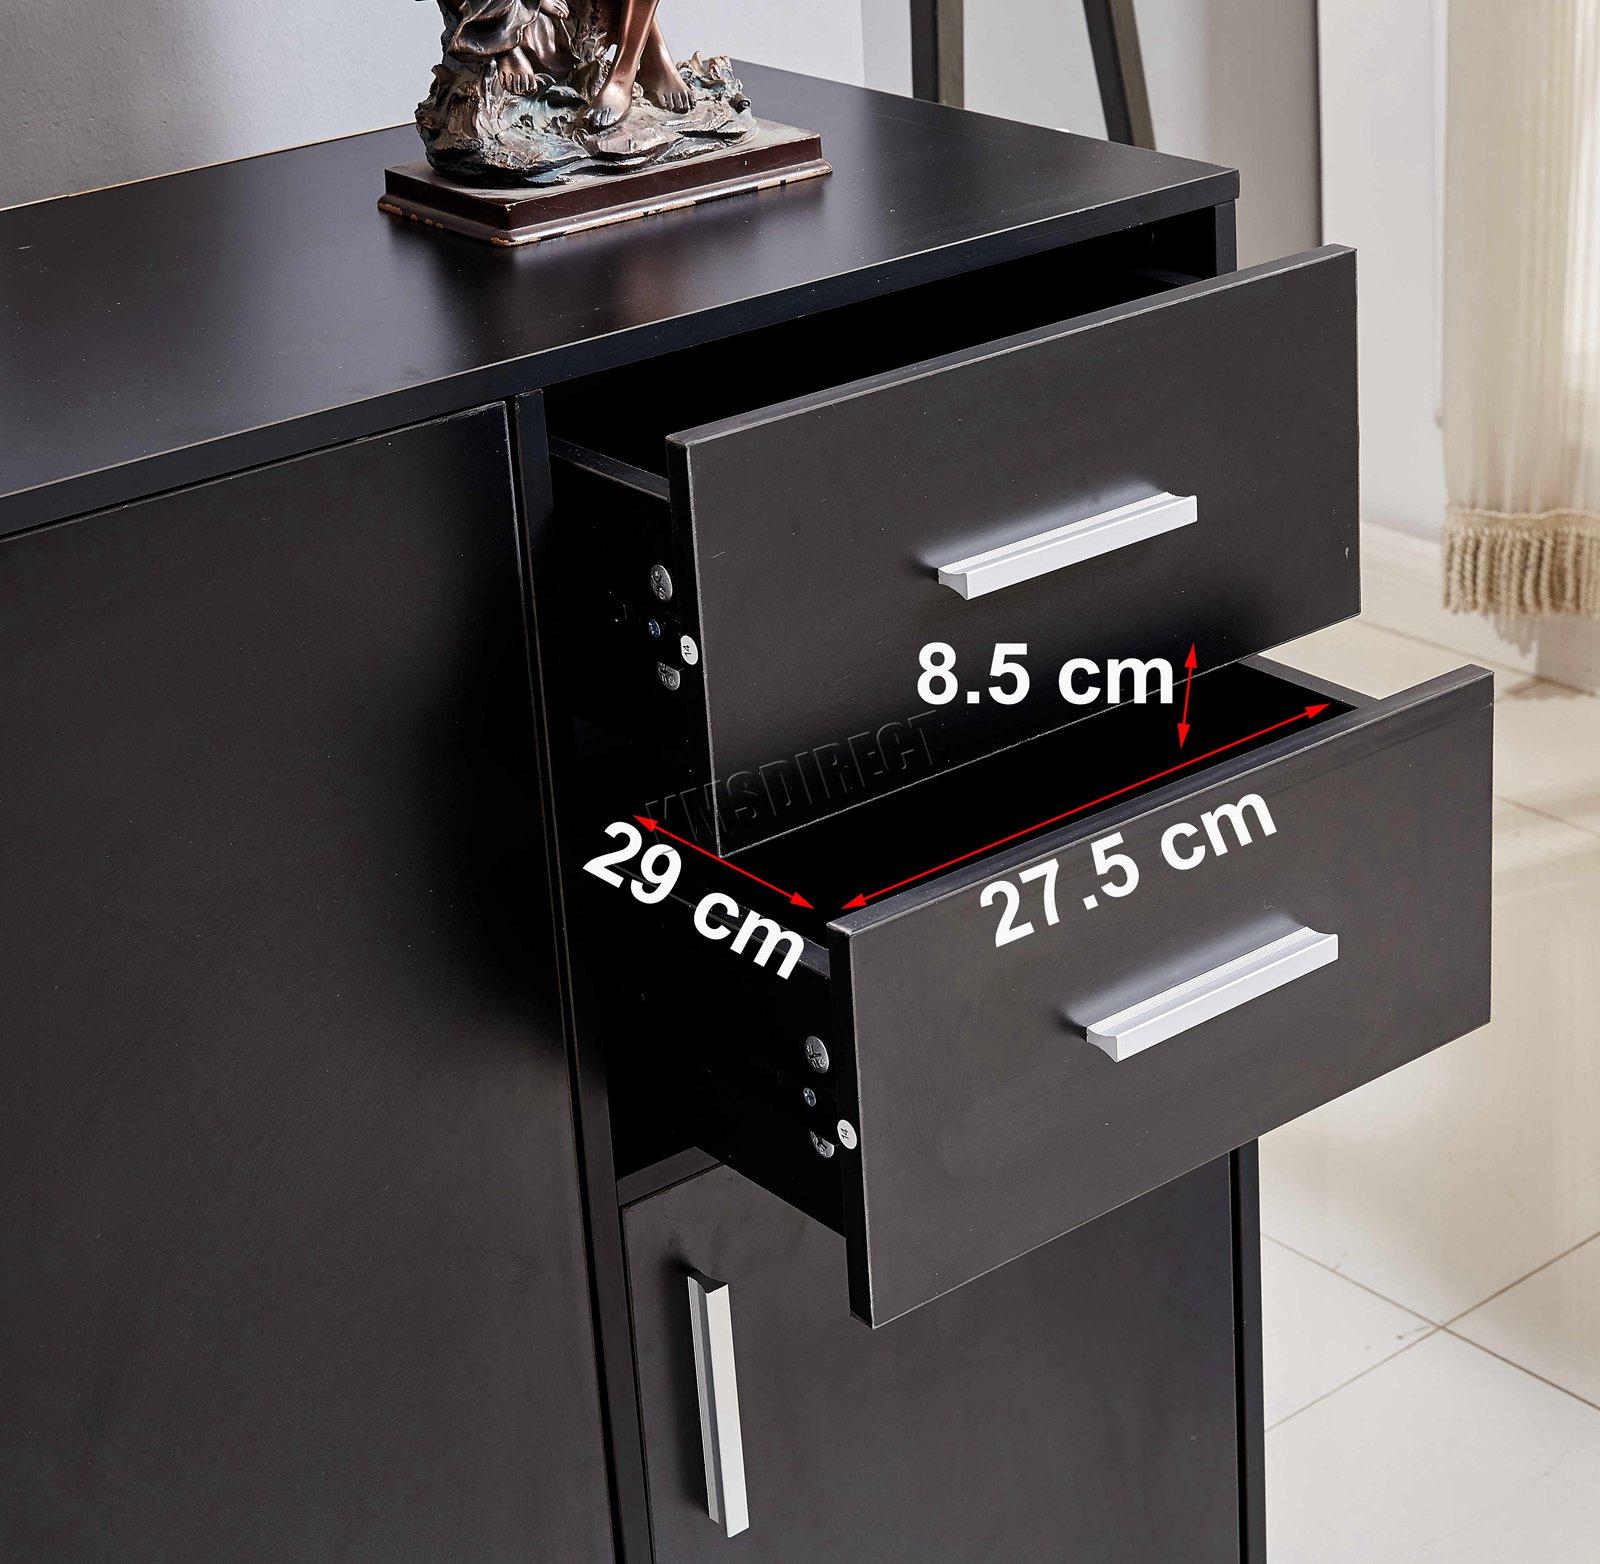 WestWood-Sideboard-Cabinet-Storage-tableware-Kitchen-Cupboard-Unit-PB-SSP01-NEW thumbnail 33